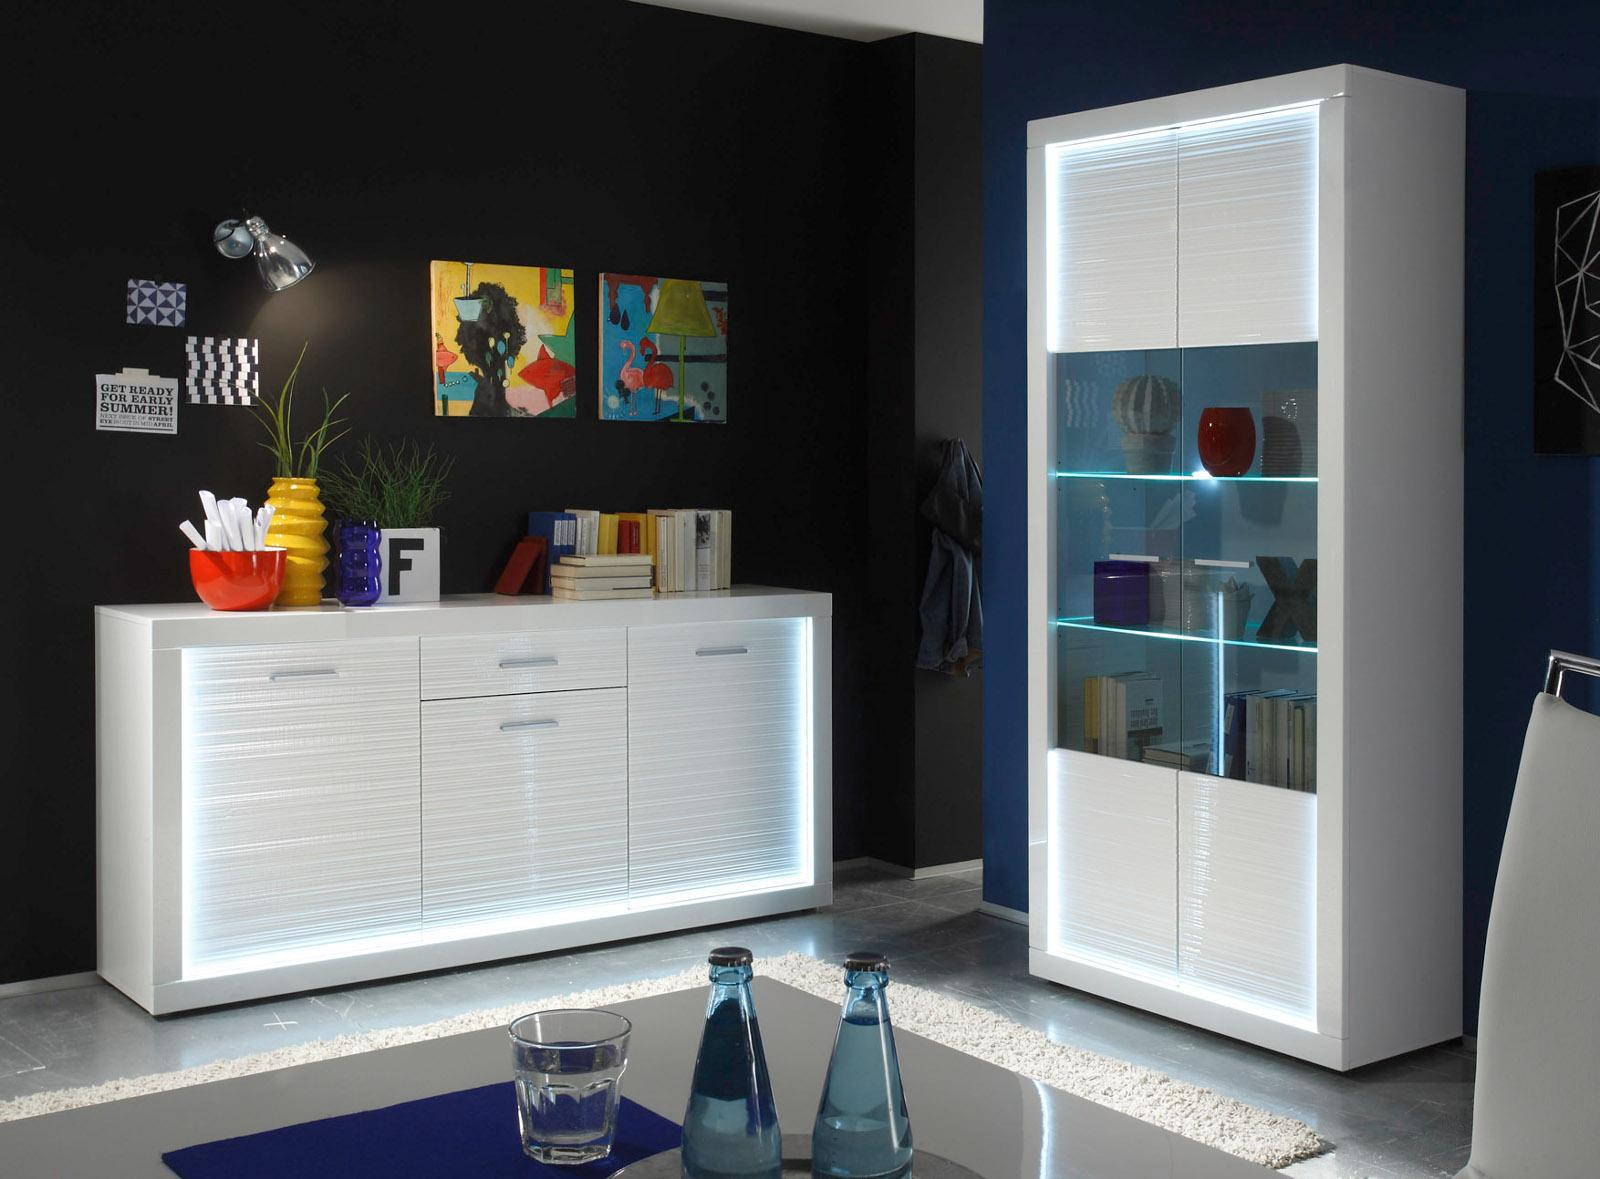 Sideboard Kommode Starlight Weiss Hochglanz Mit Rillenoptik Inklusive LED Beleuchtung